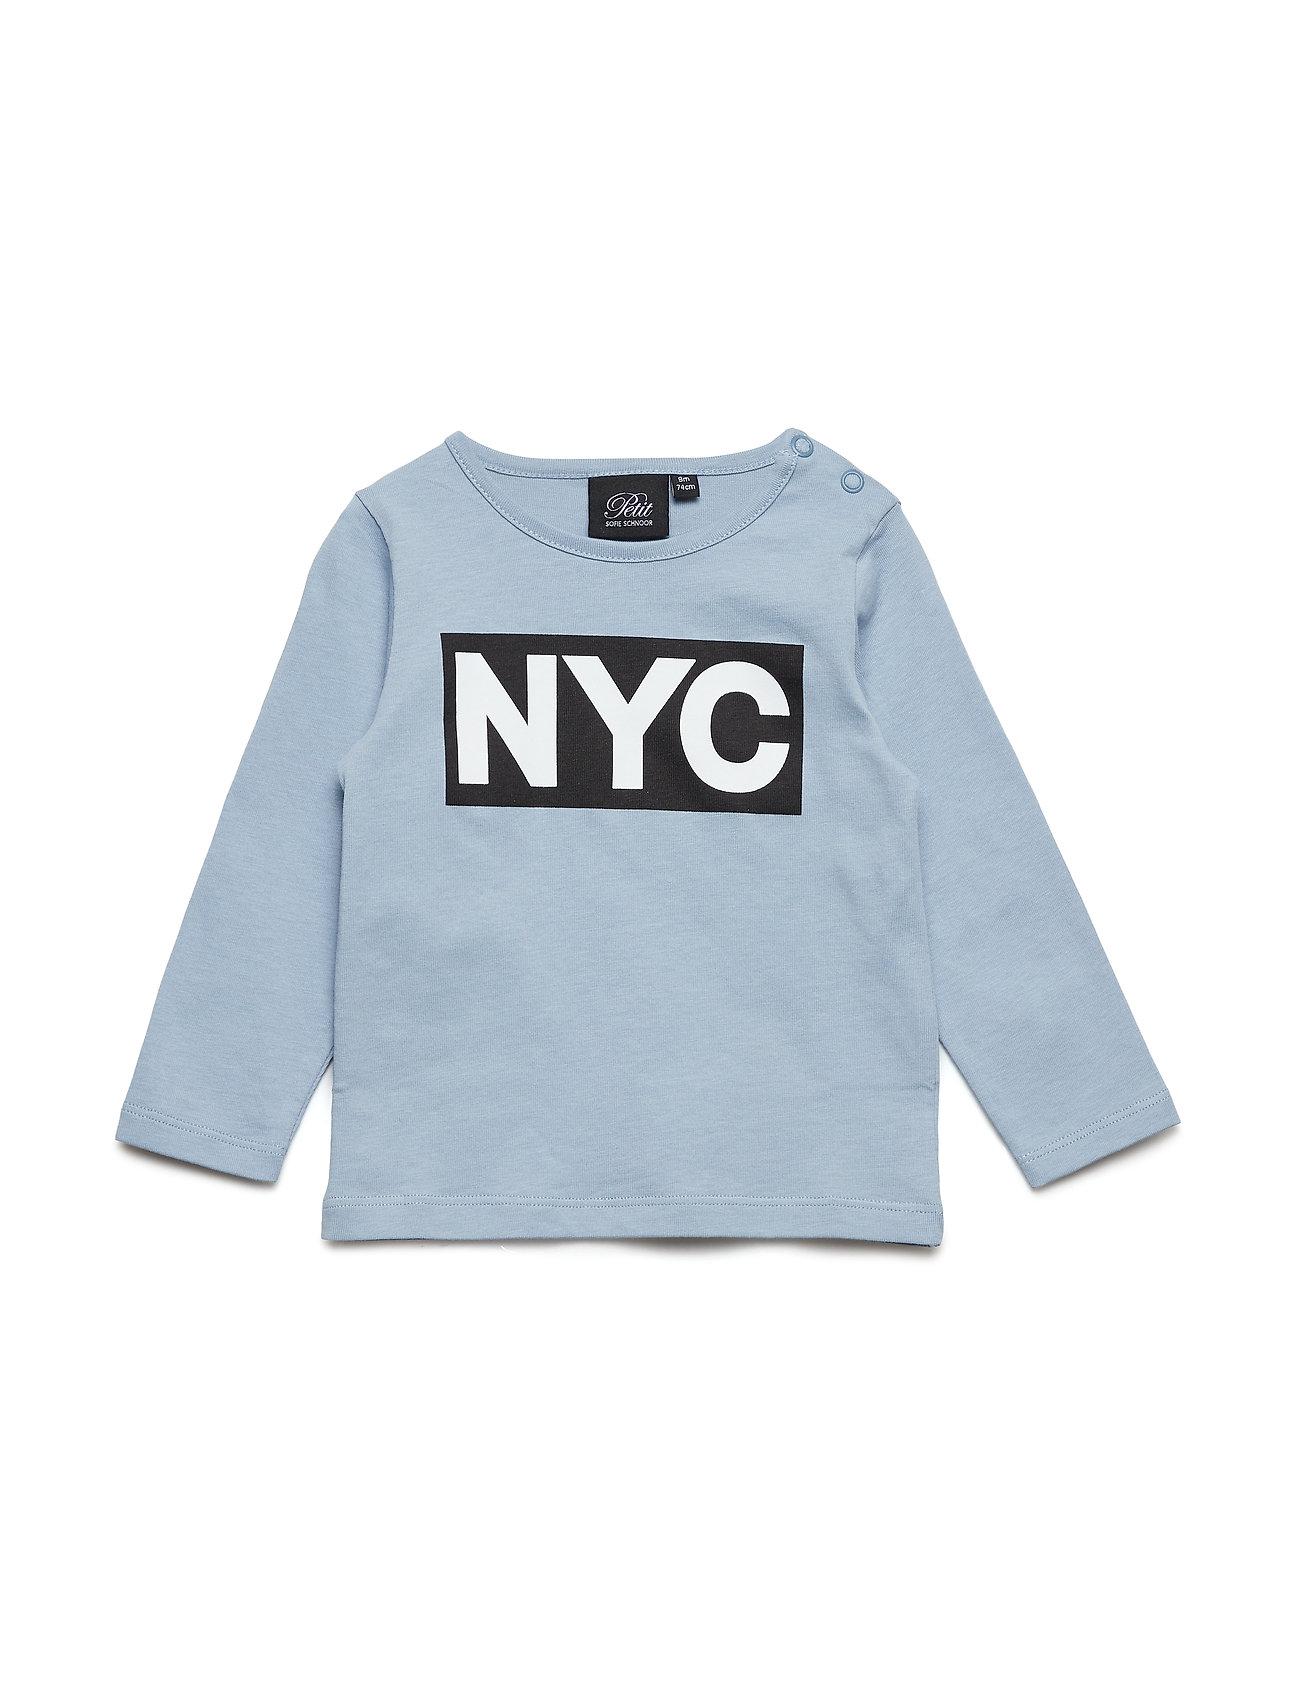 cd124db661e Blå Petit by Sofie Schnoor Shirt Nyc langærmede t-shirts & toppe for ...